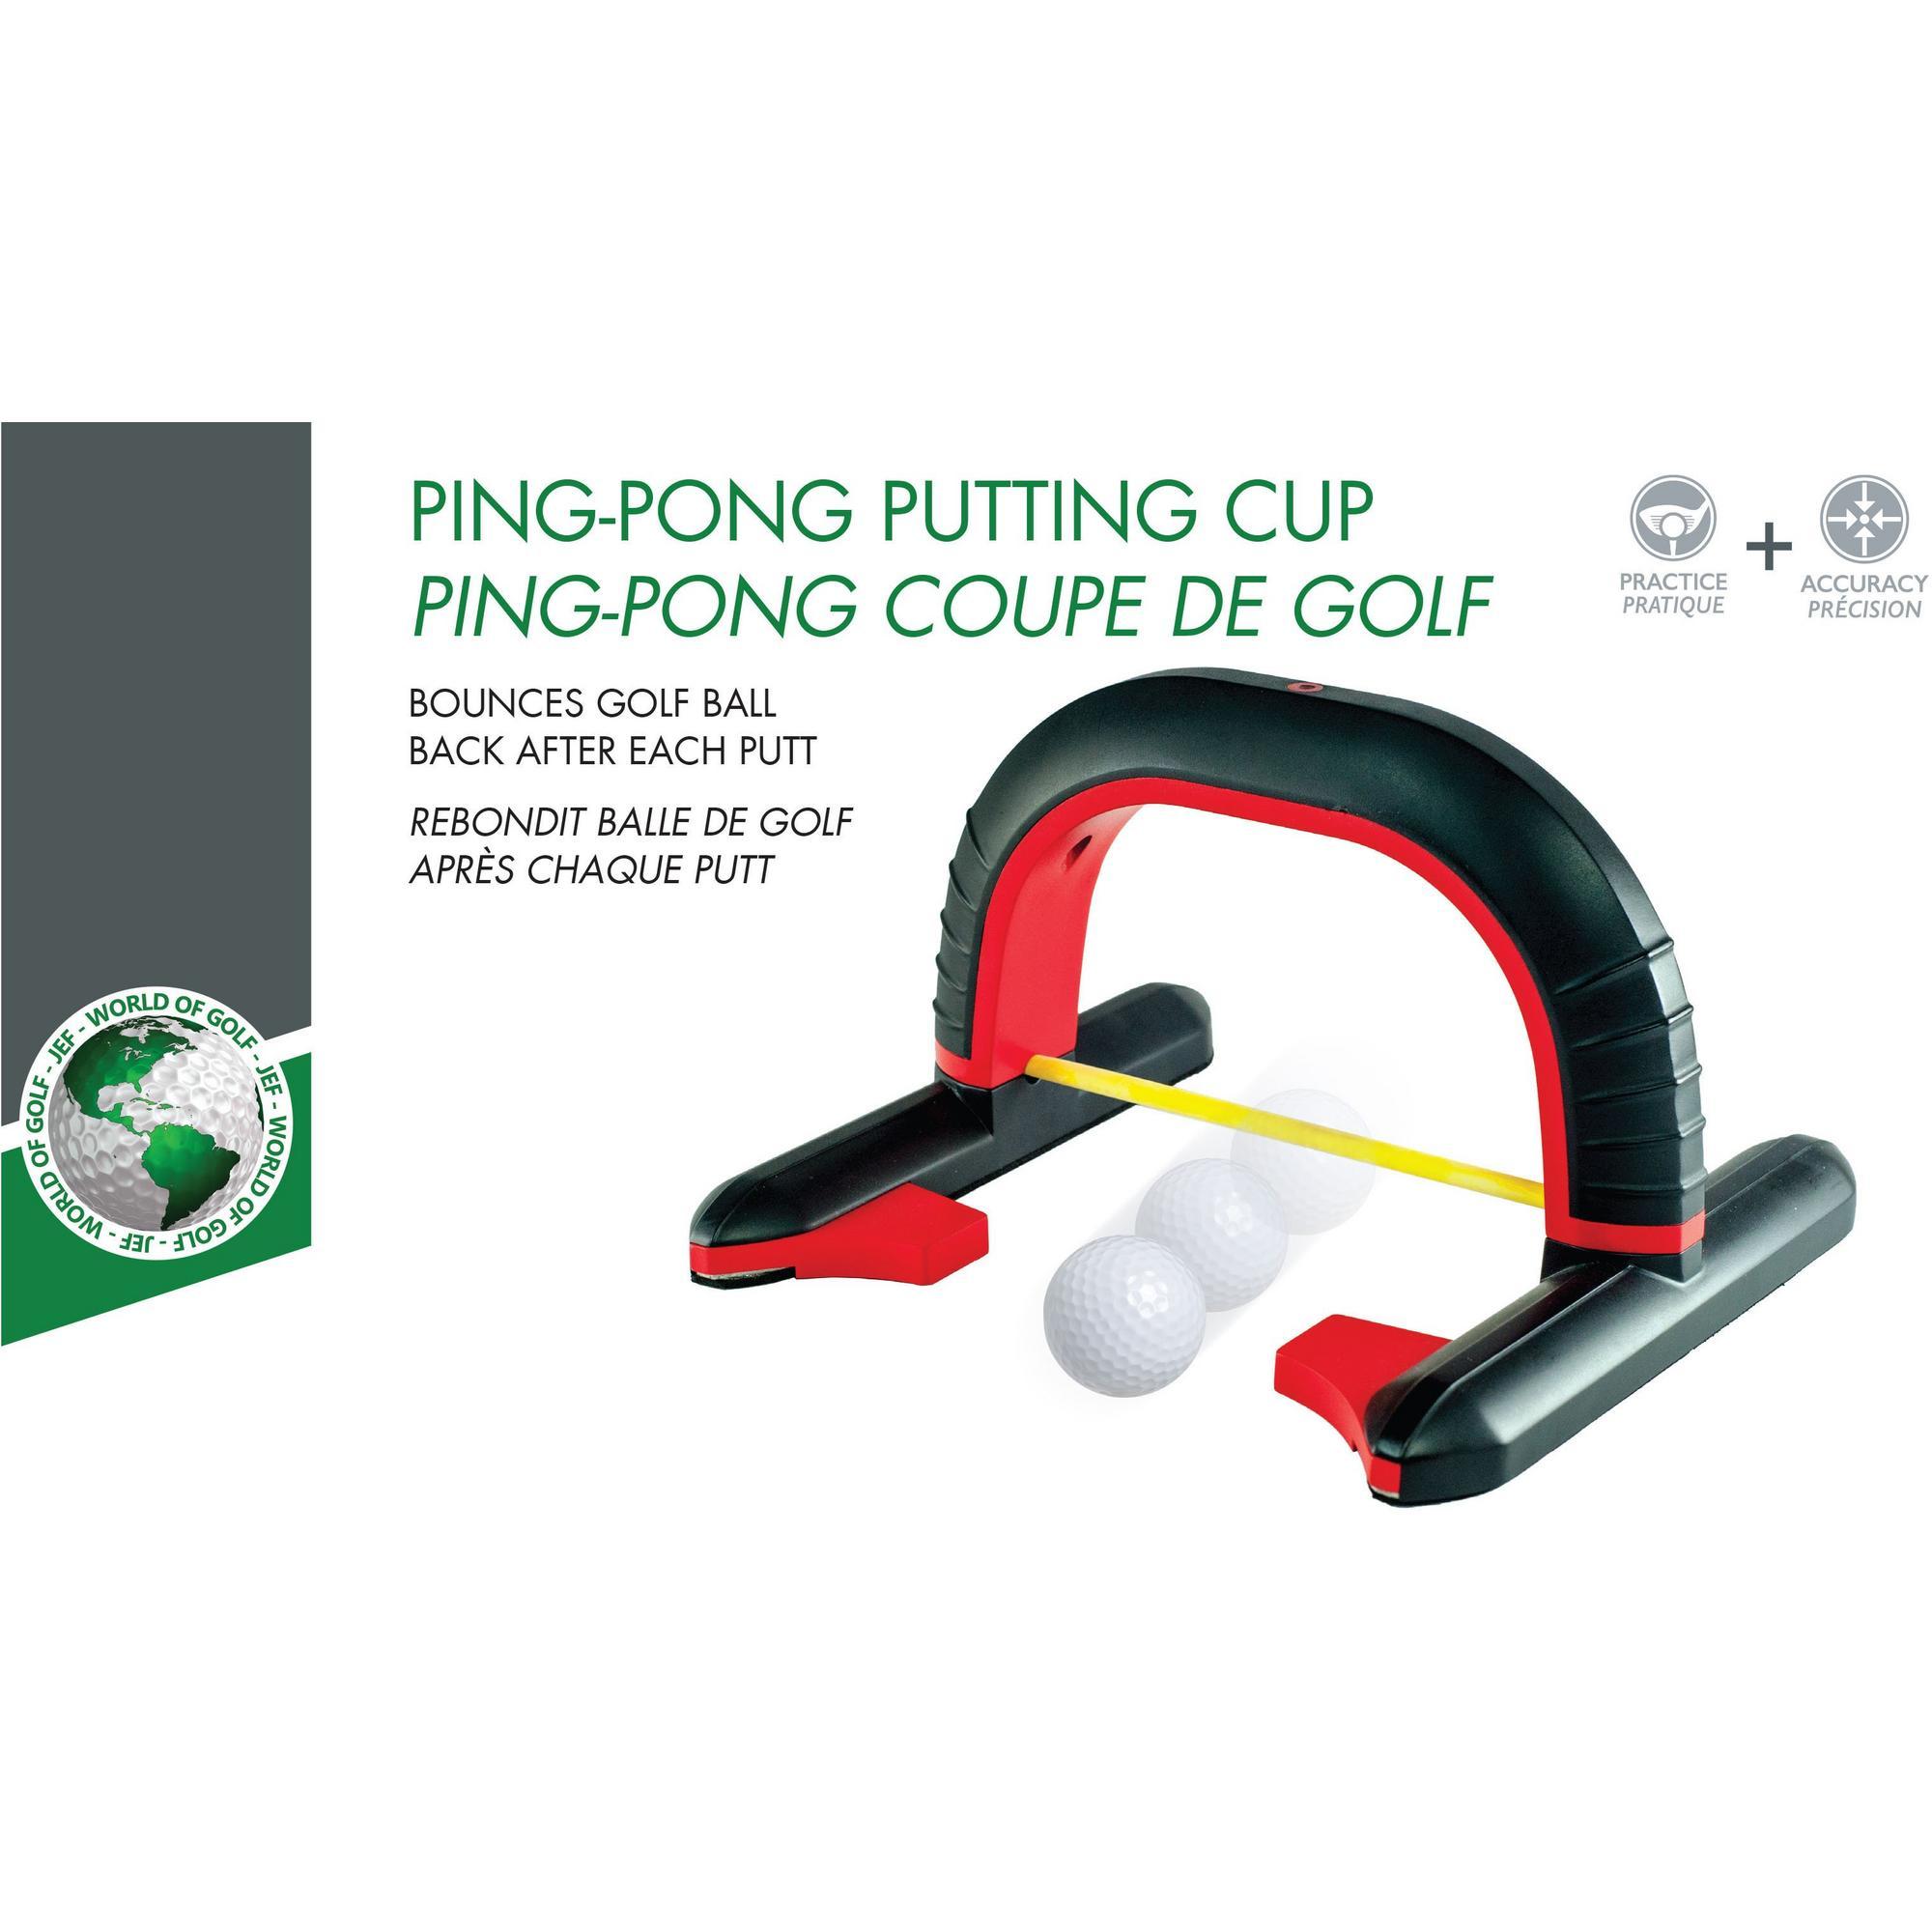 Ping Pong Golf putting unit